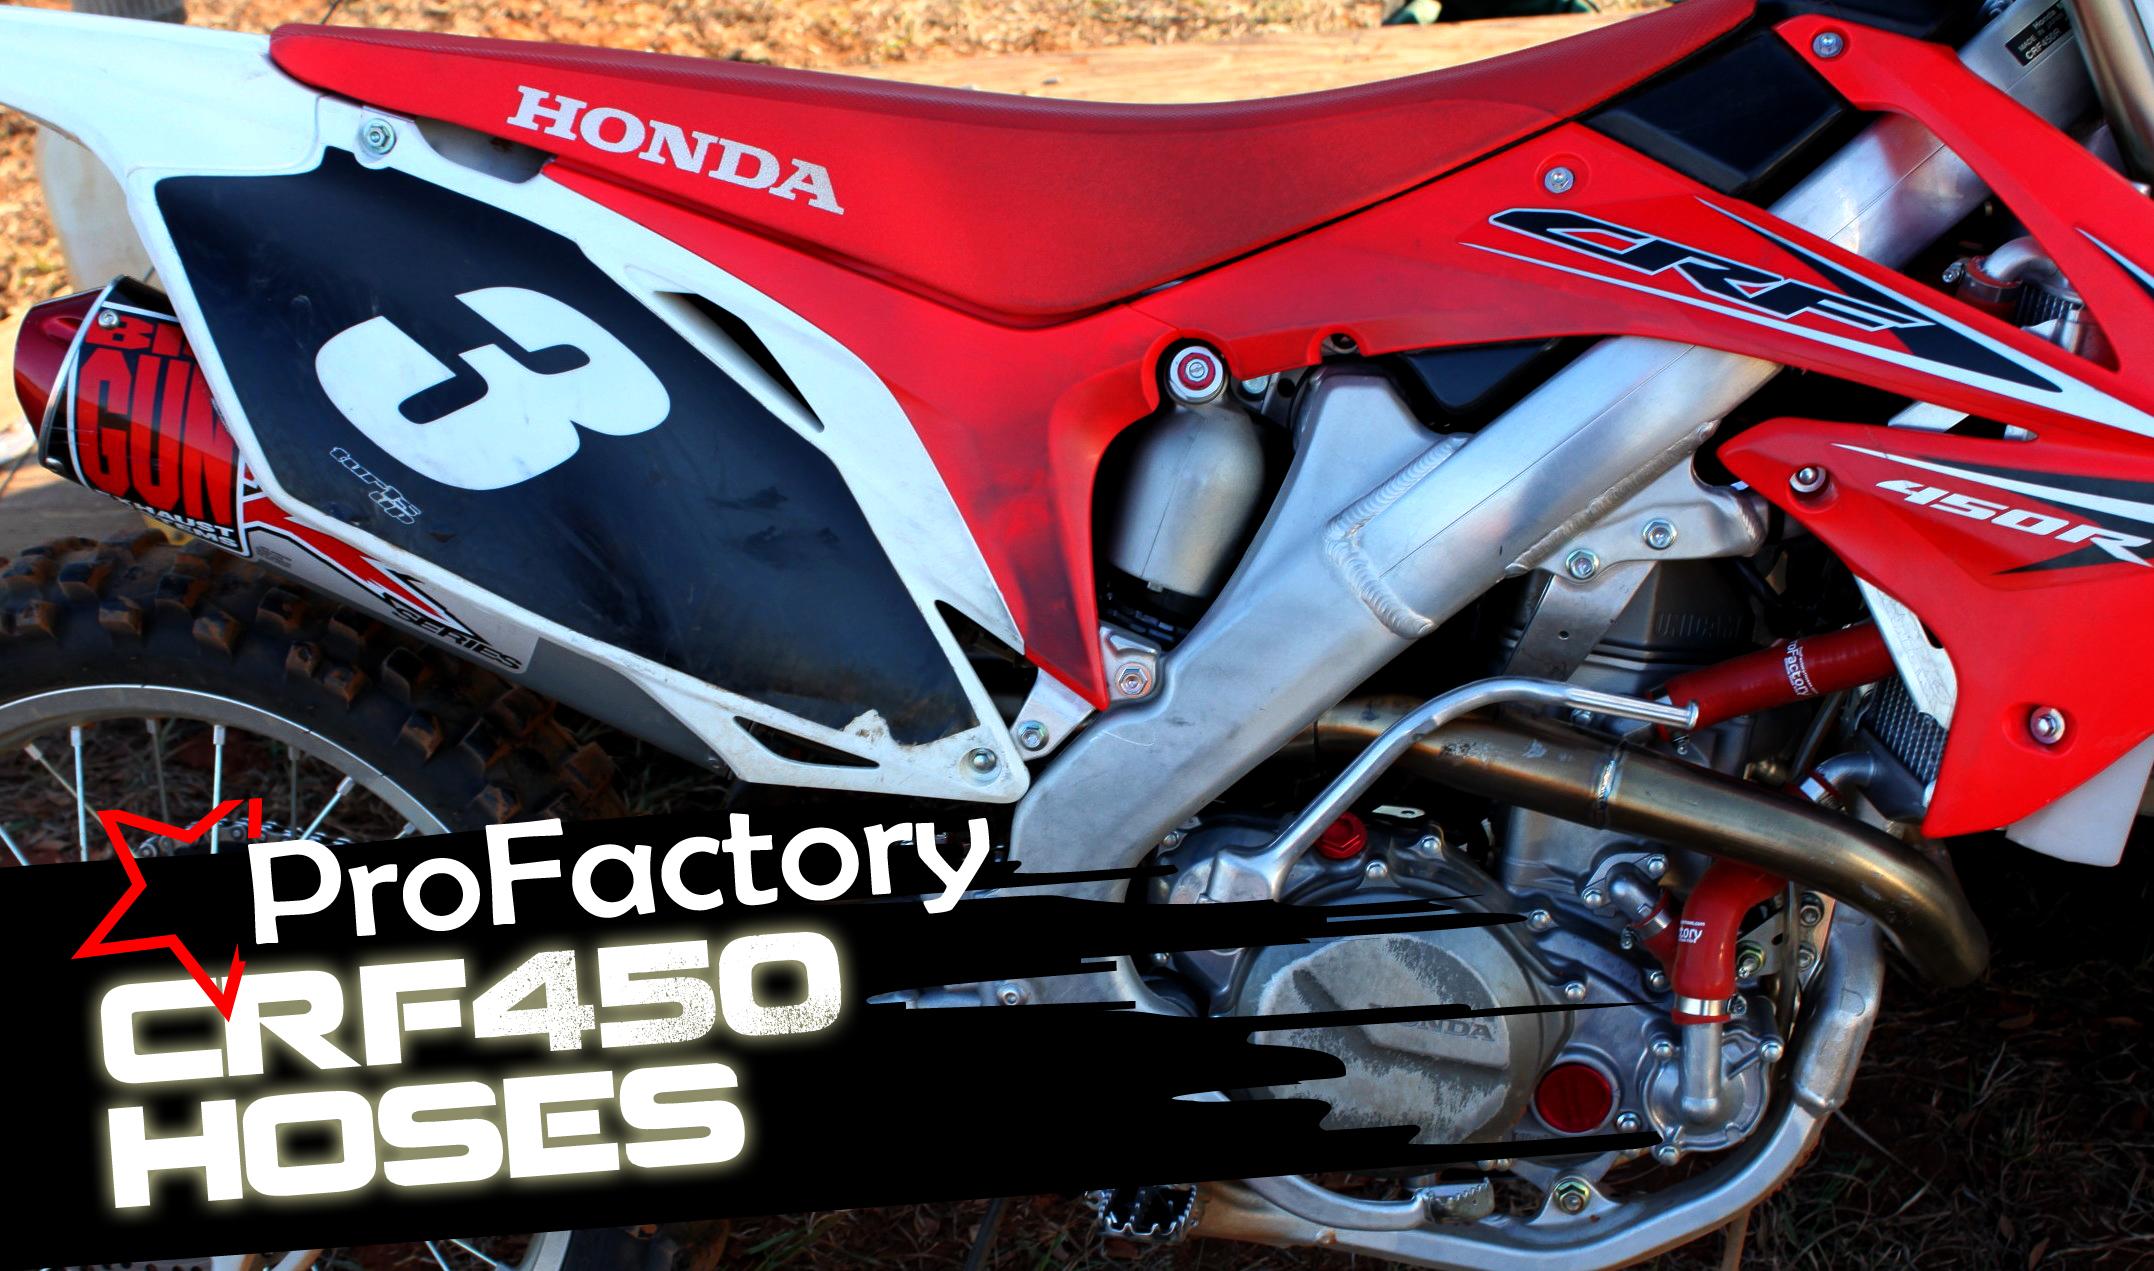 crf450-hoses.jpg